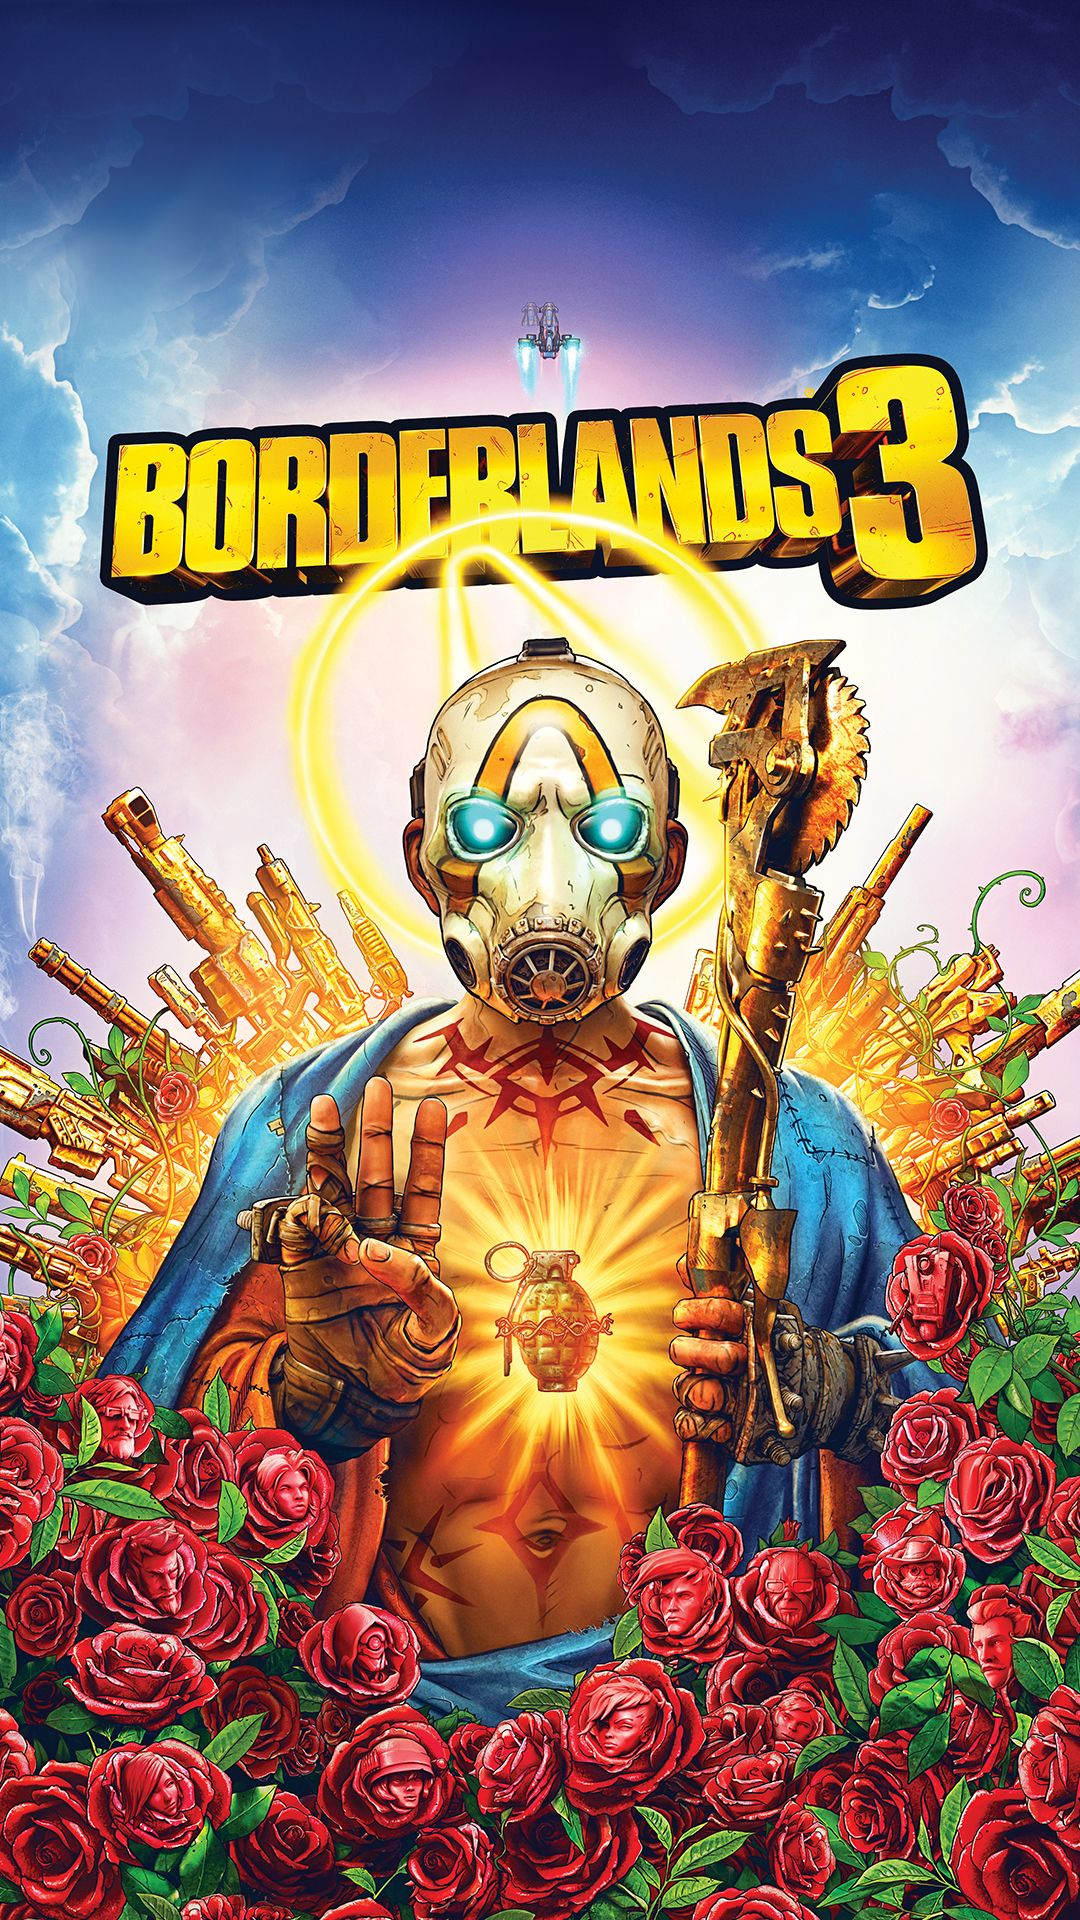 Borderlands 3 Phone Wallpaper